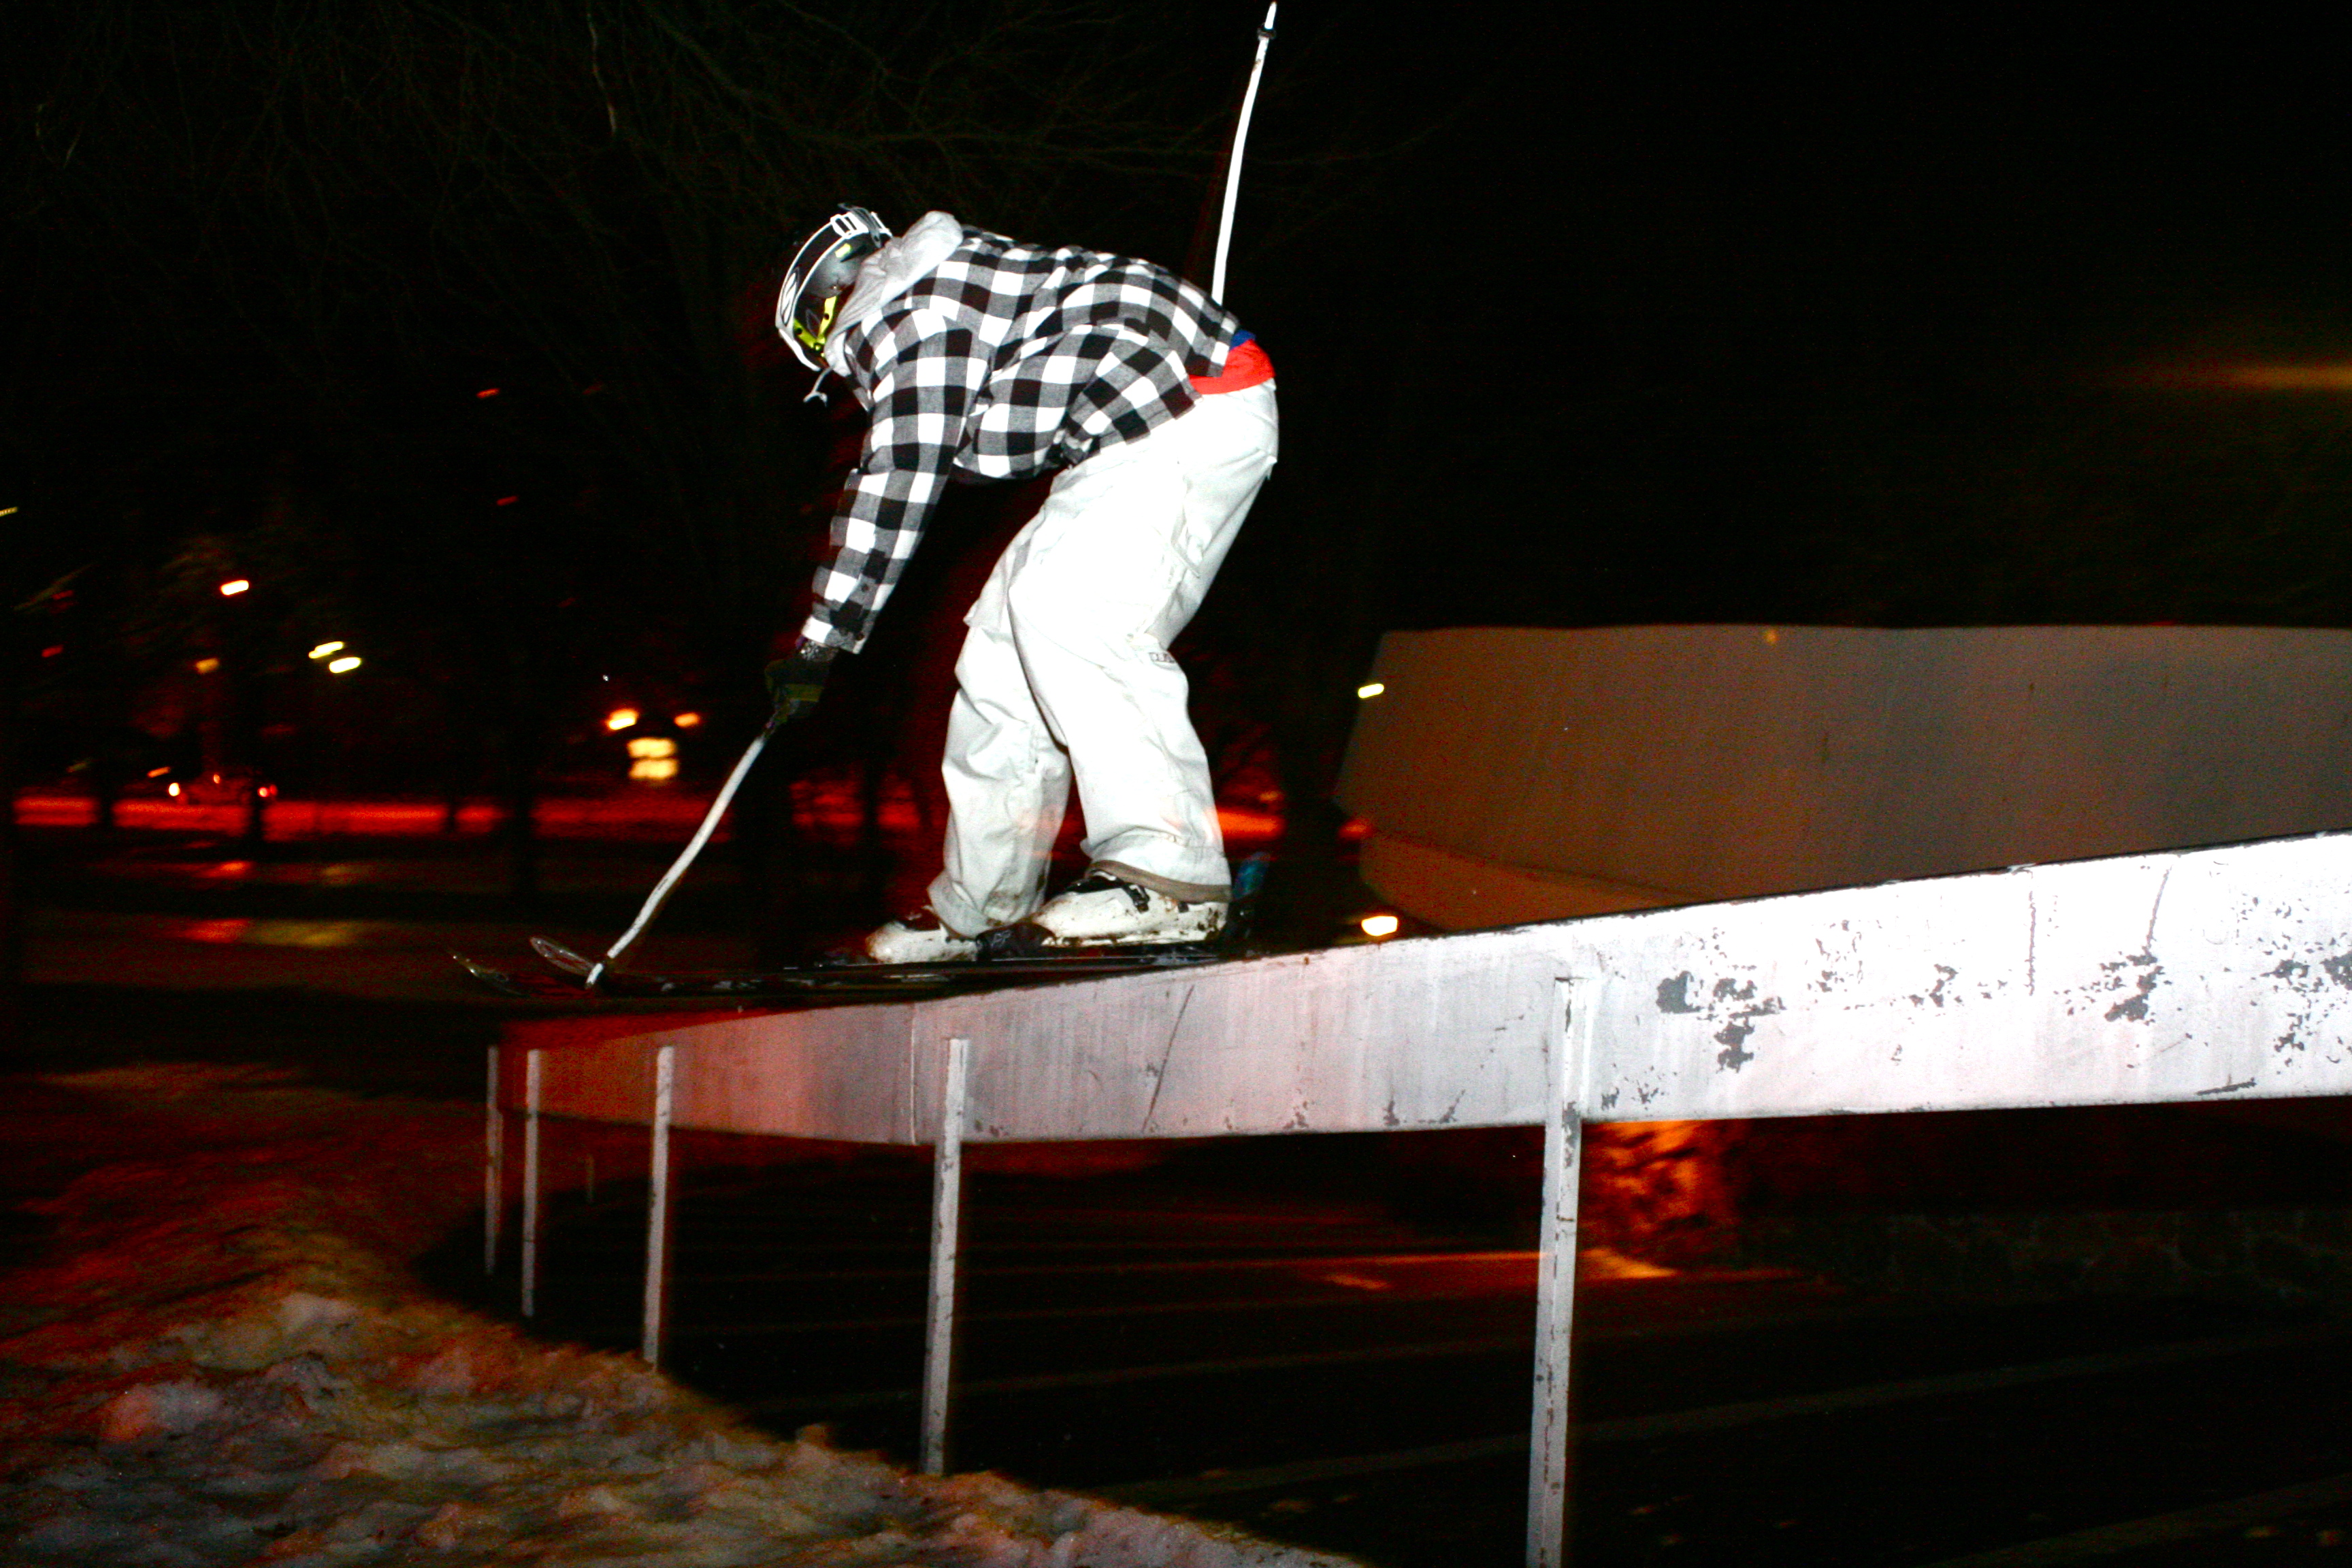 Troy C-rail night shot